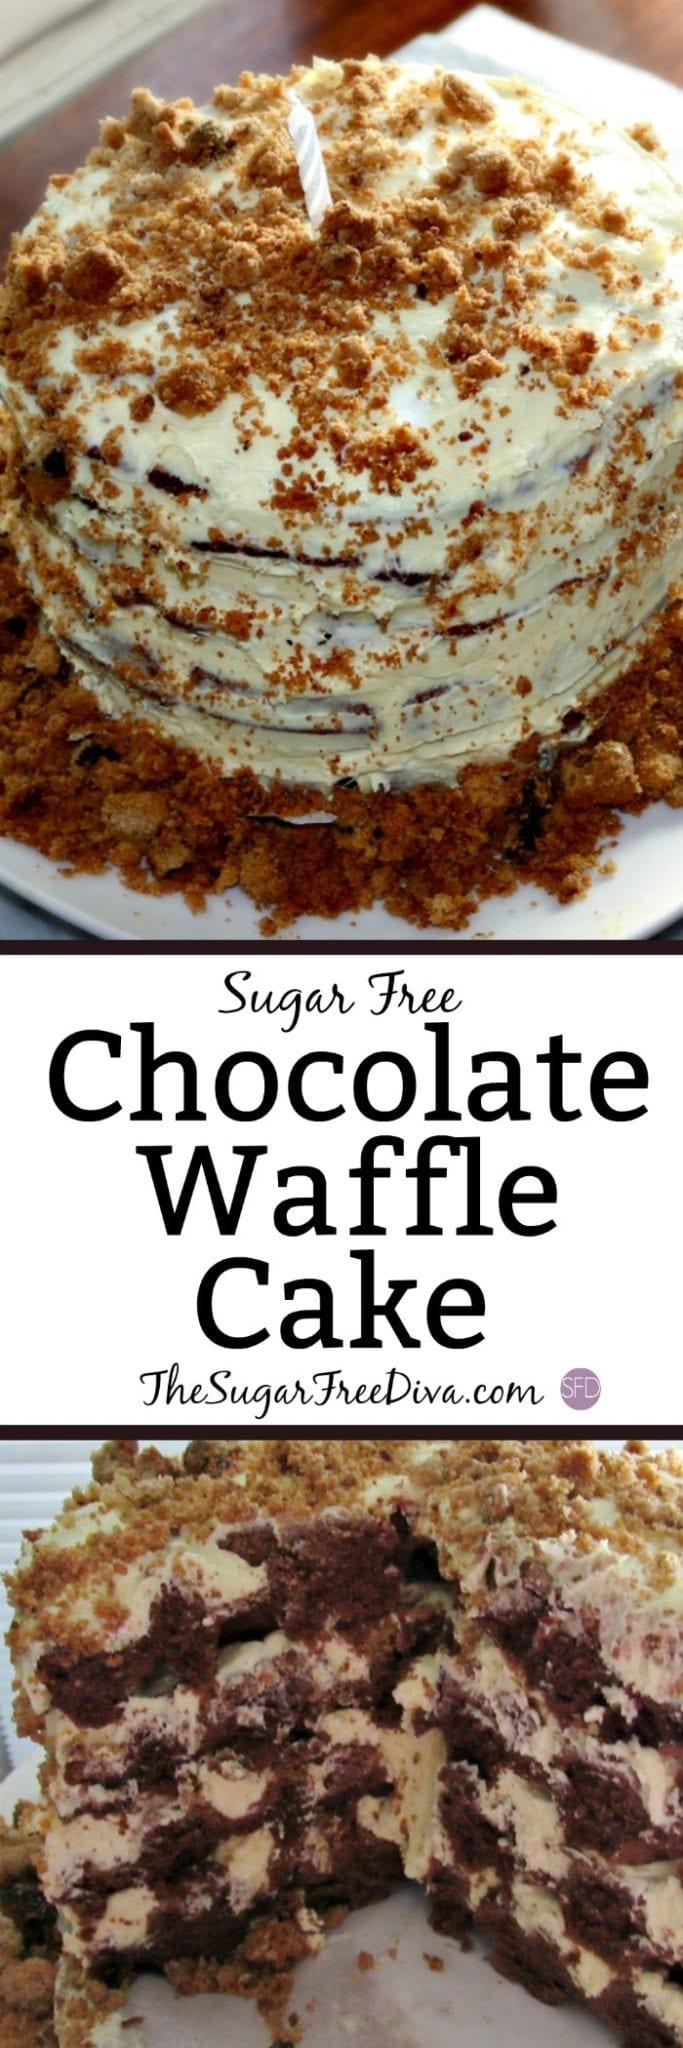 Sugar Free Chocolate Waffle Cake